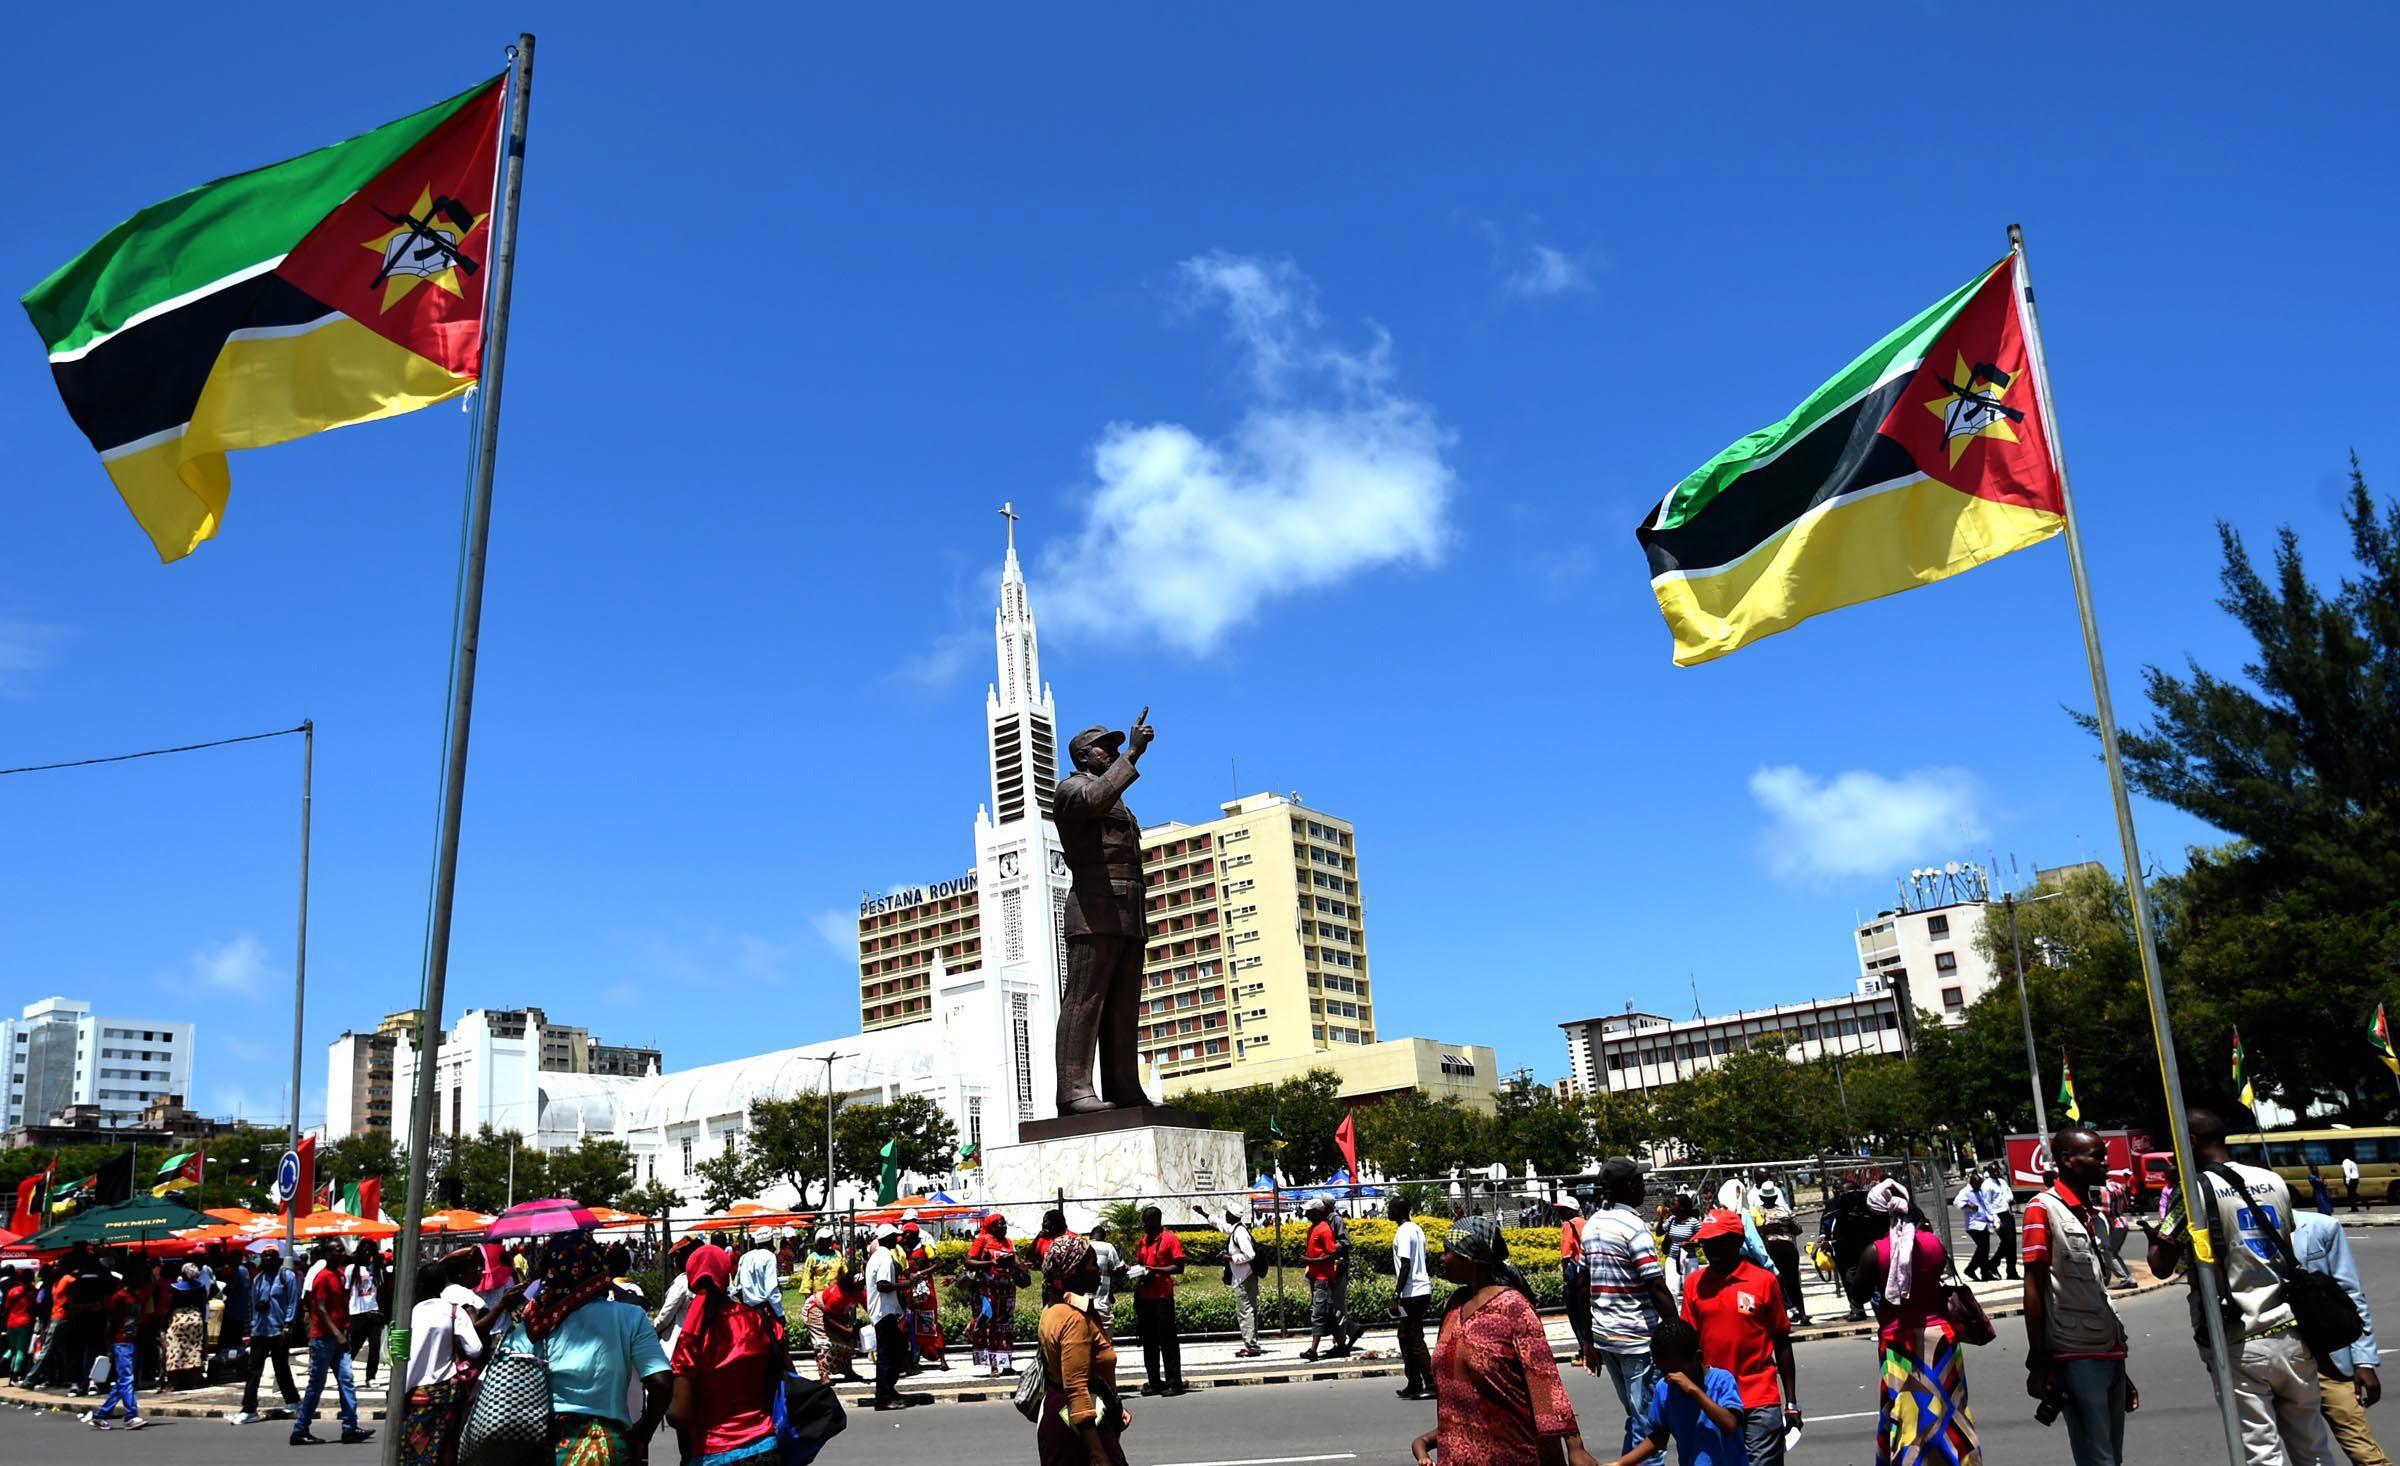 Moçambique volta a alargar prazo da auditoria à dívida pública